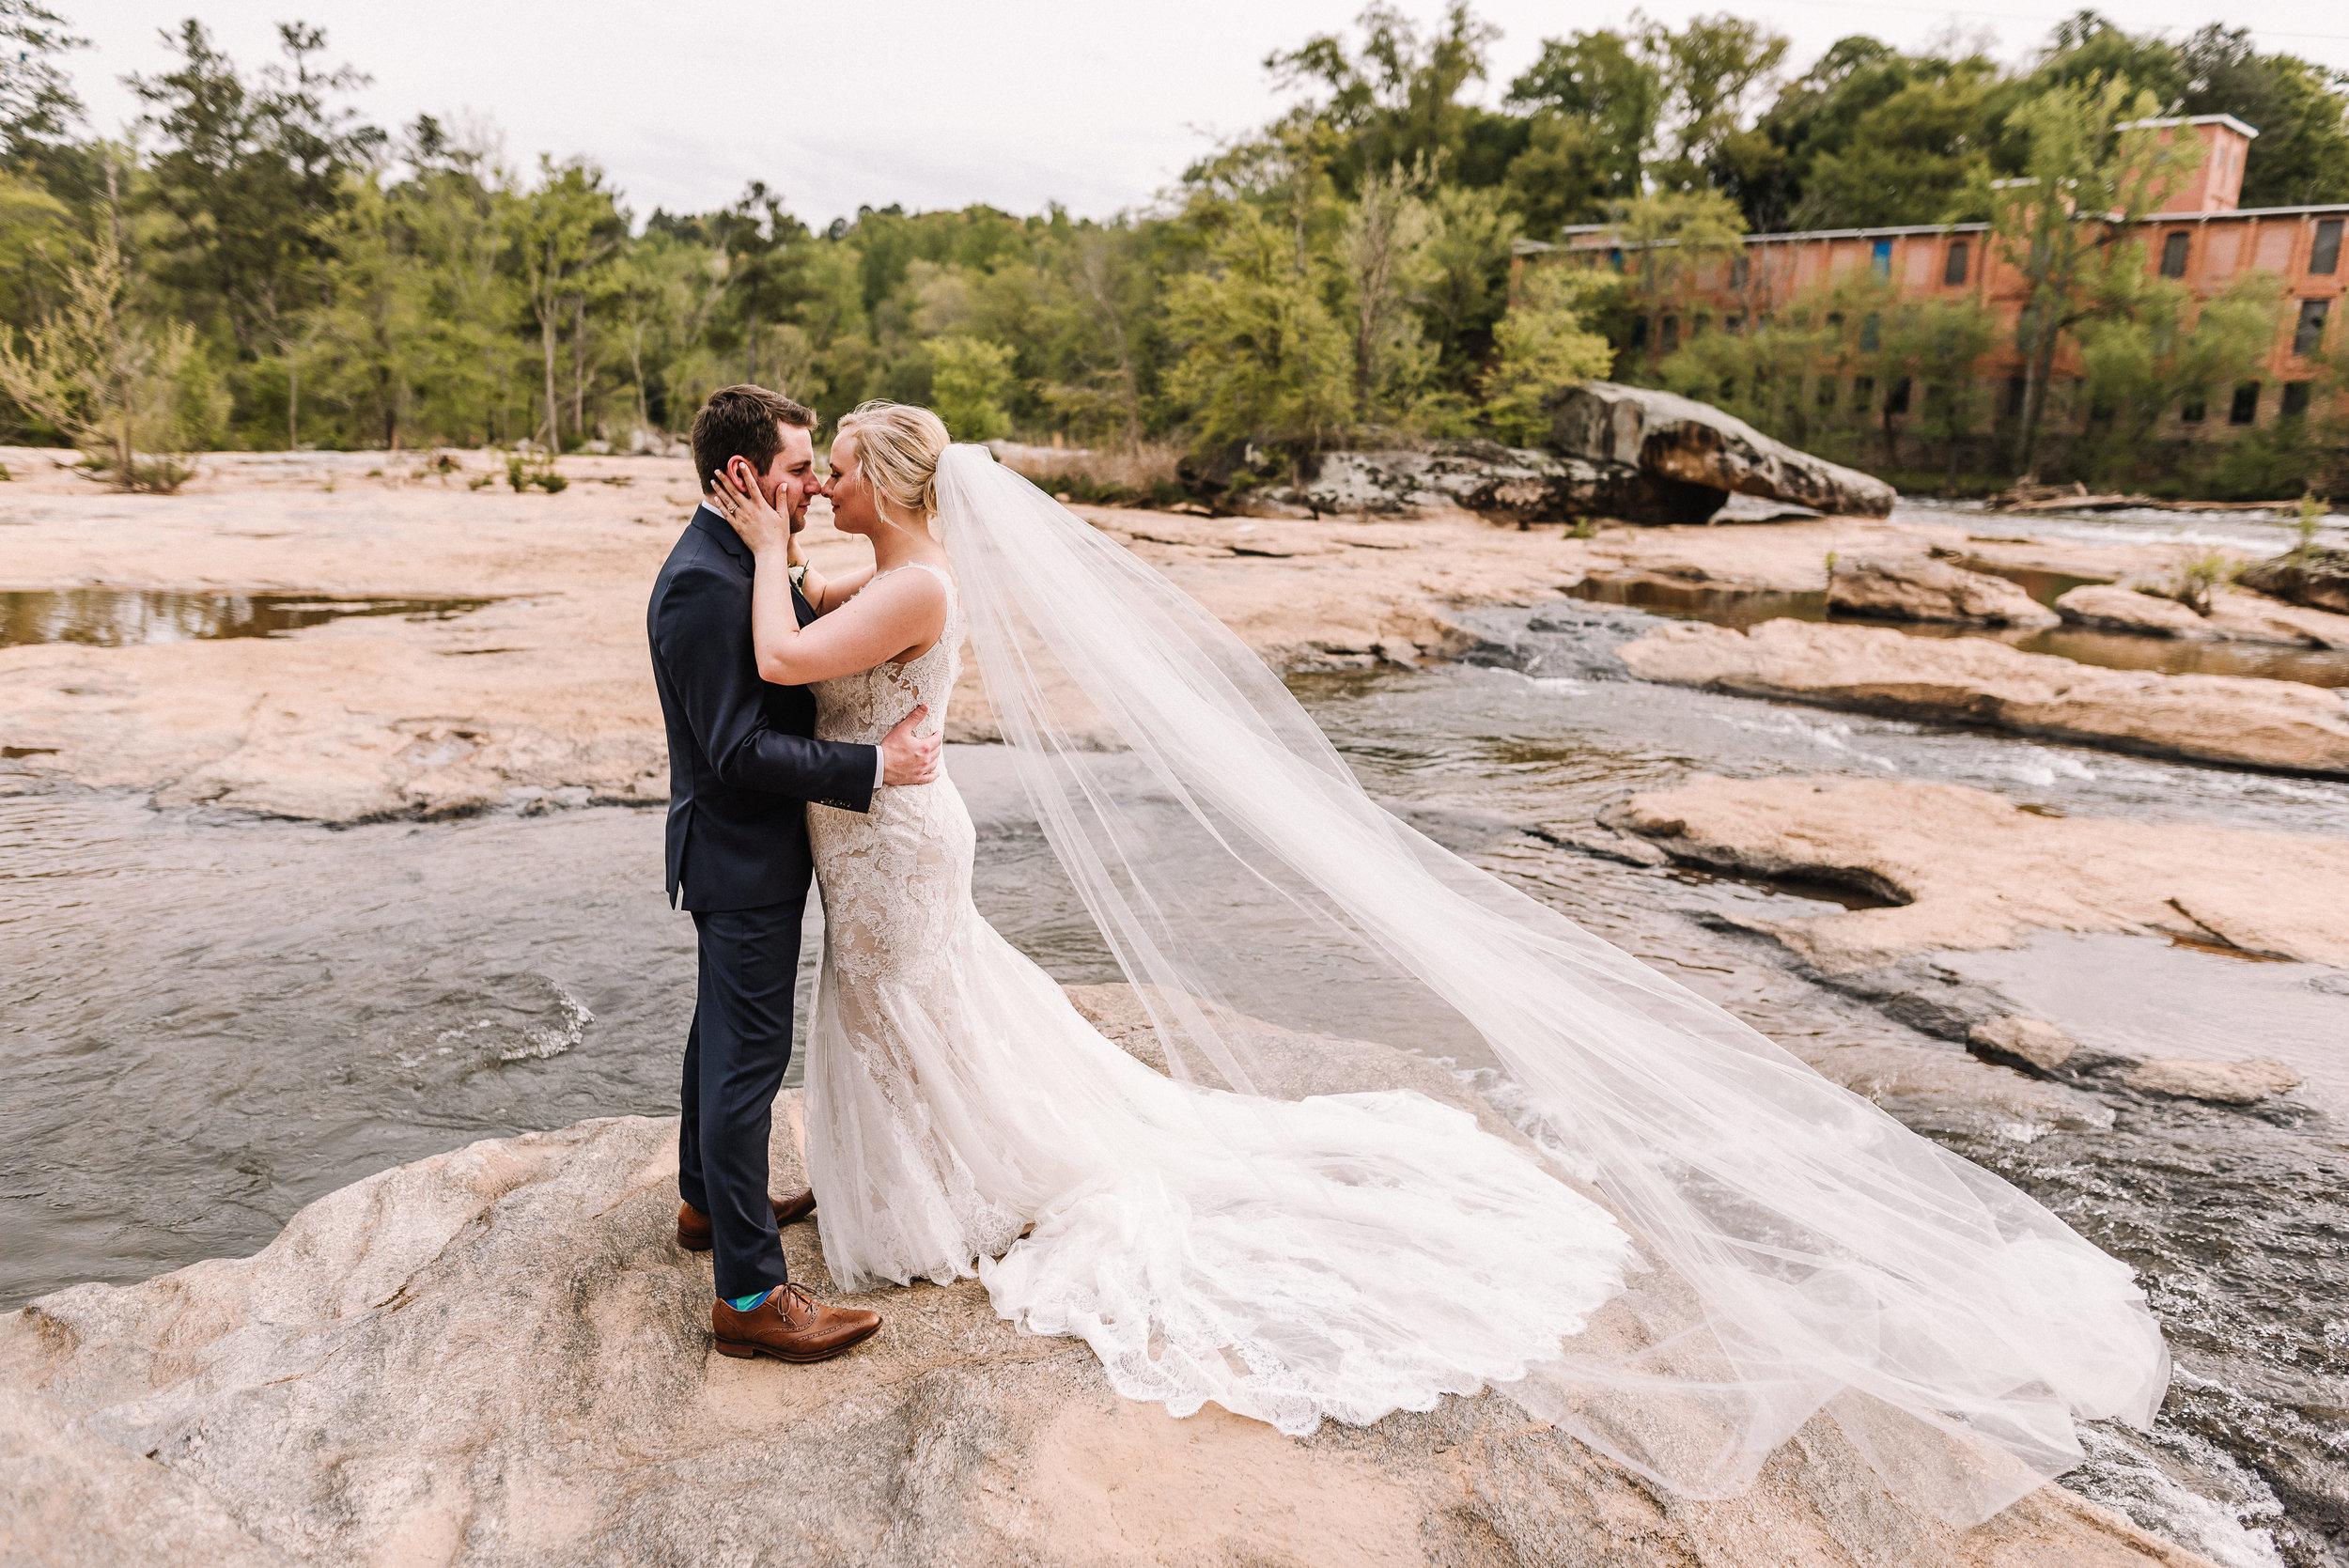 Morgan Wedding_Mill at Yellow River_Ashley Benham Photography-903.jpg